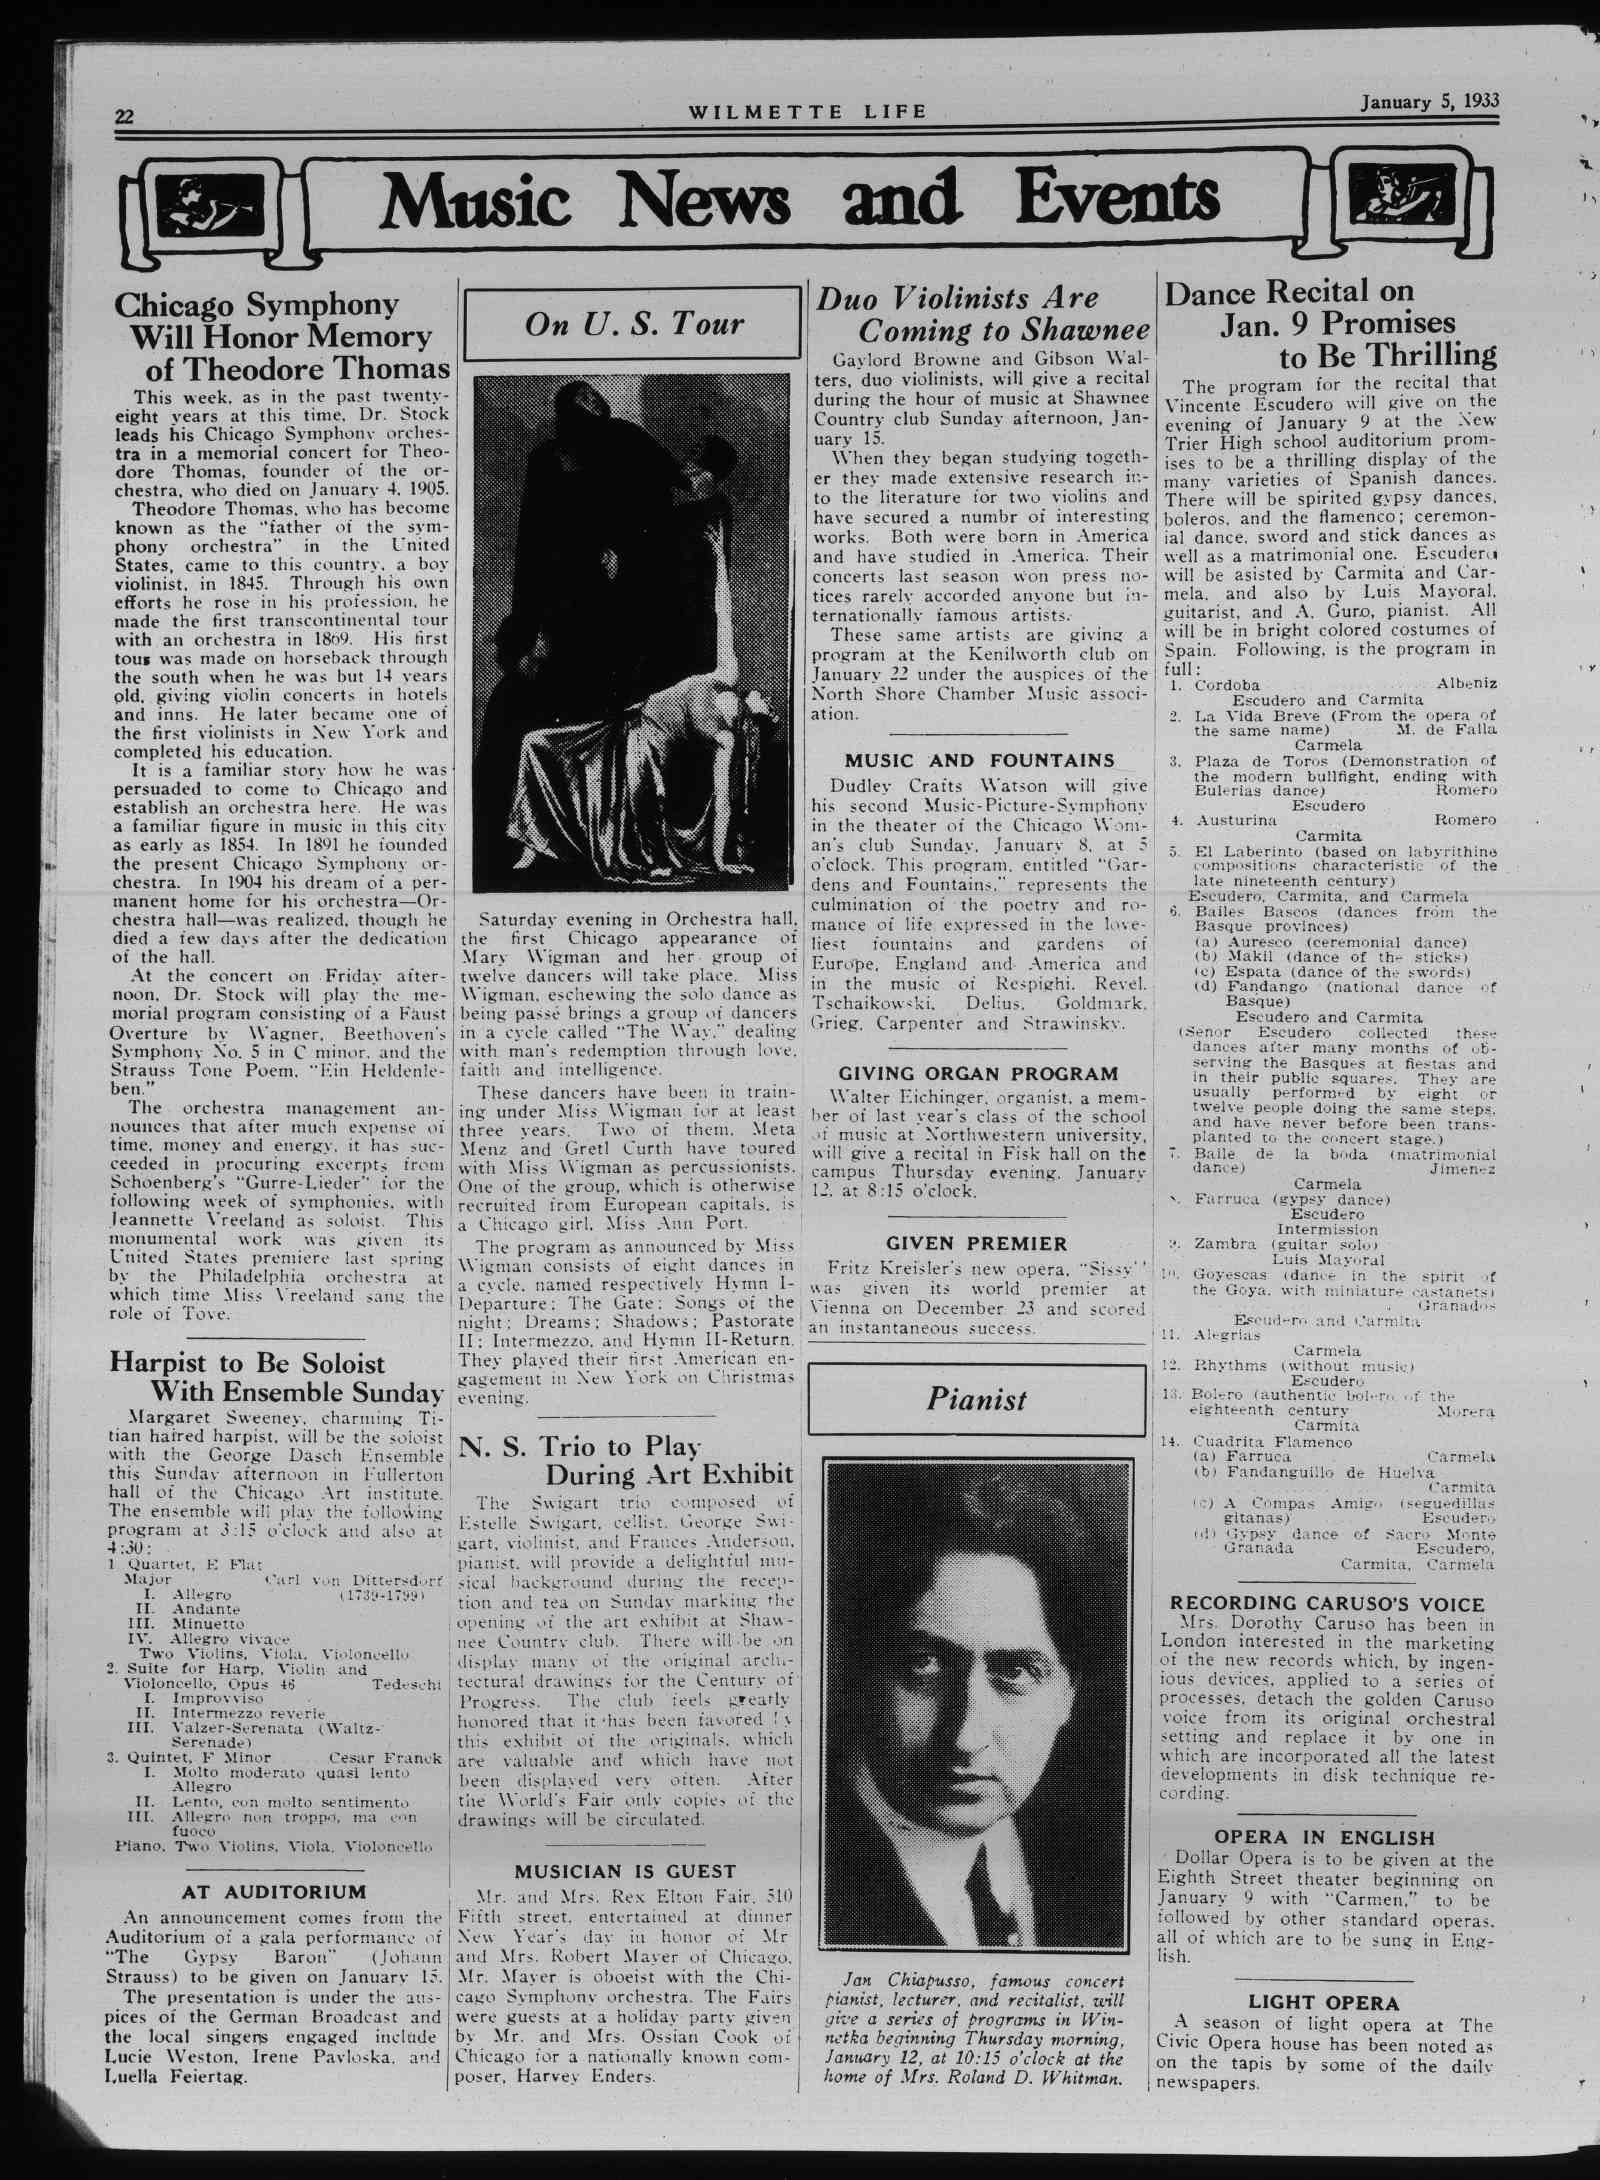 Wilmette Life (Wilmette, Illinois), 5 Jan 1933